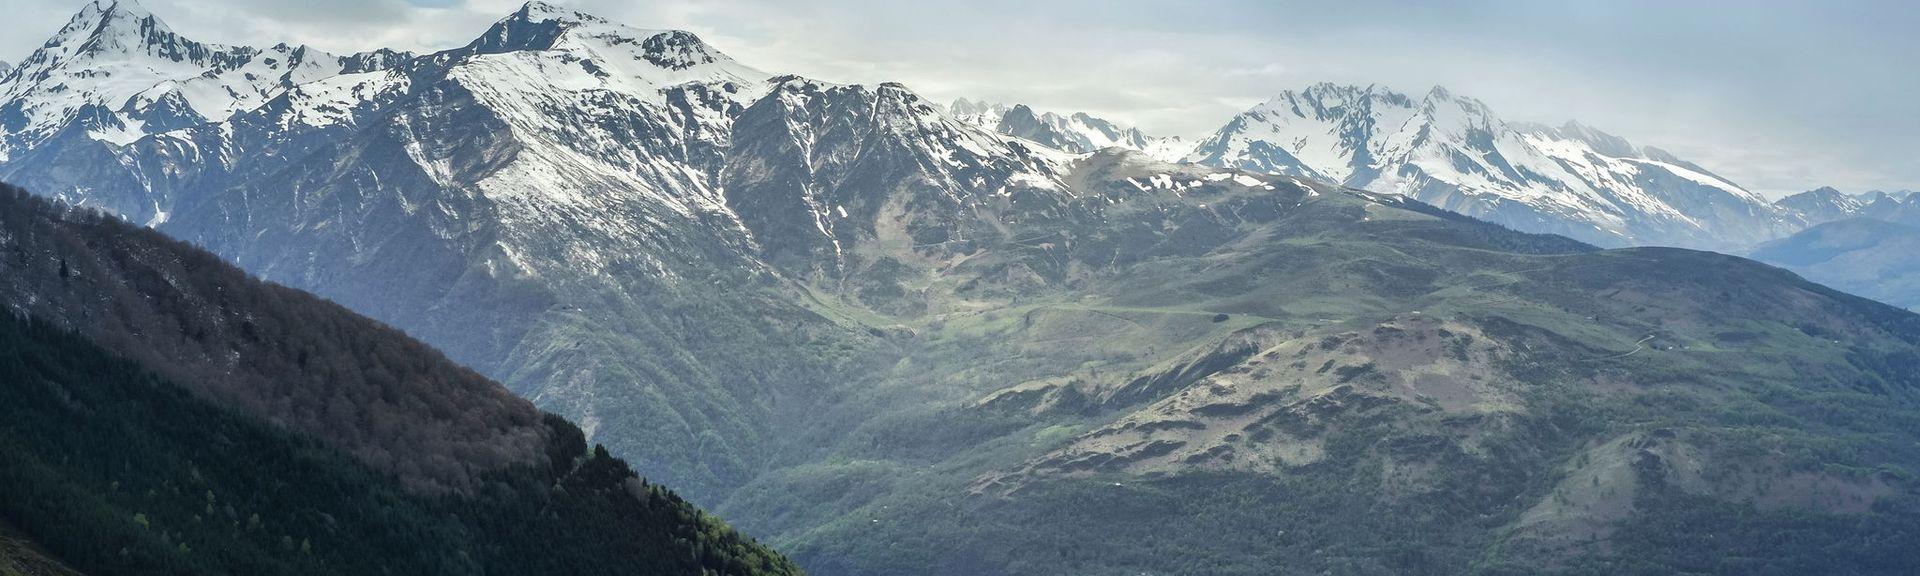 Orignac, Hautes-Pyrénées, Frankrijk